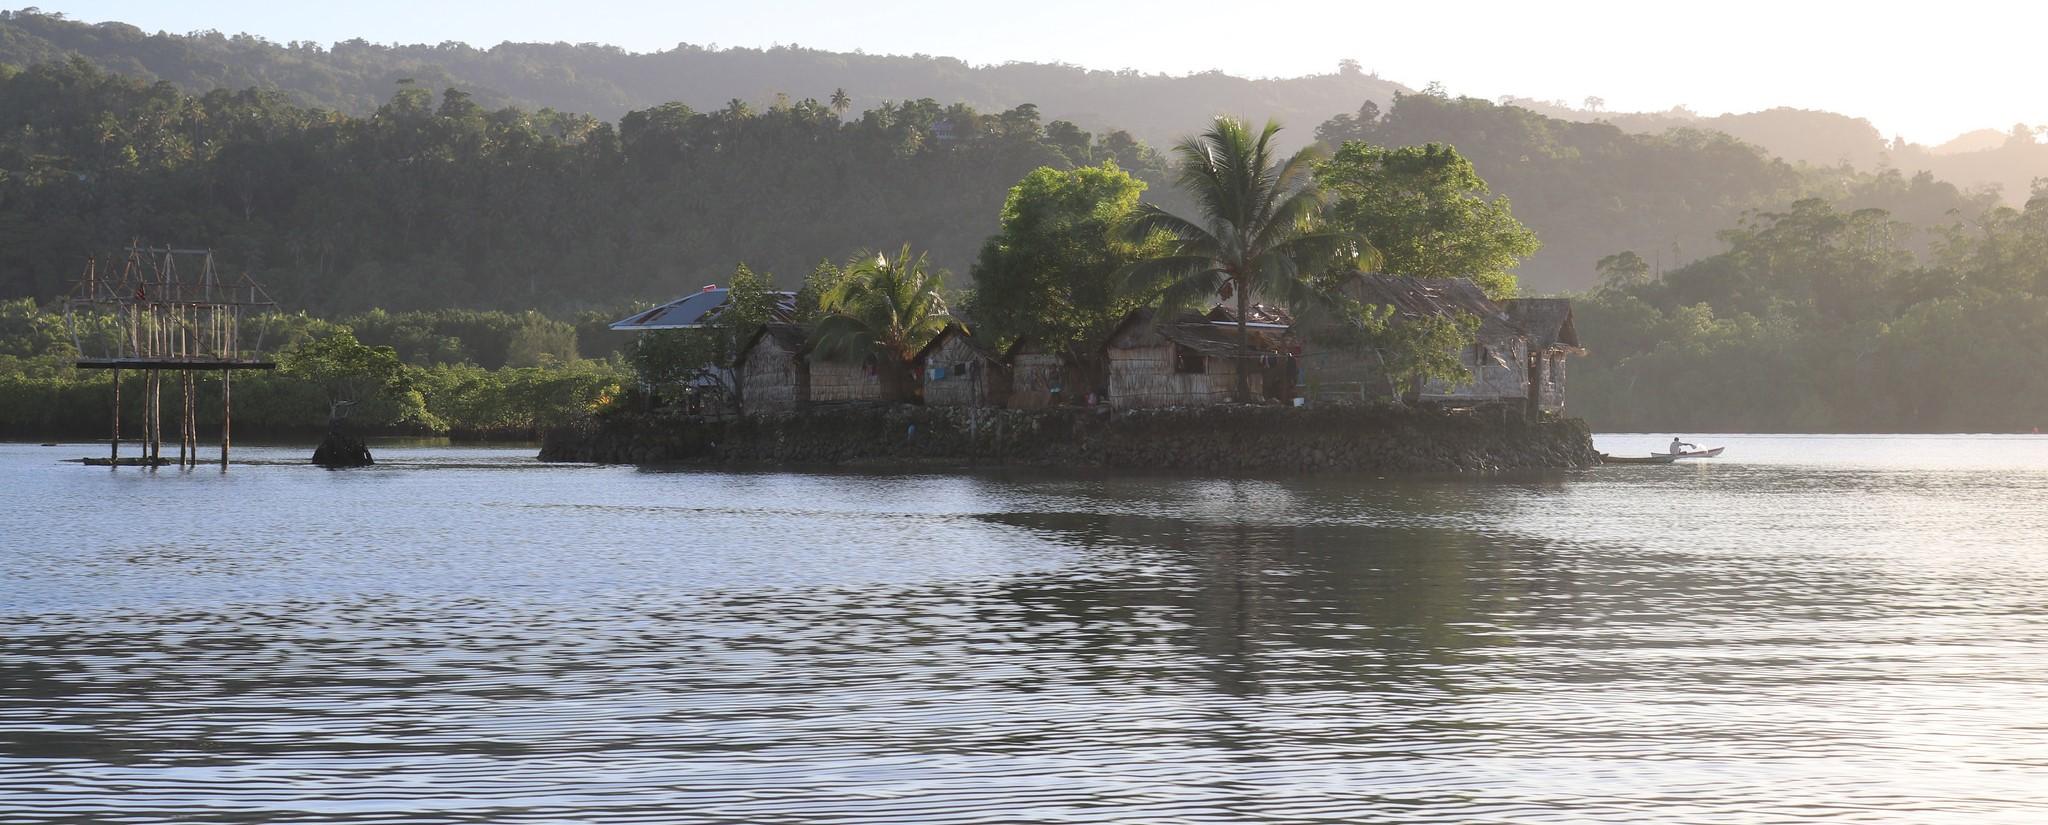 Langalanga lagoon, Solomon Islands, October 2017 (Photo: Caitlin Clifford/UN Women/Flickr)